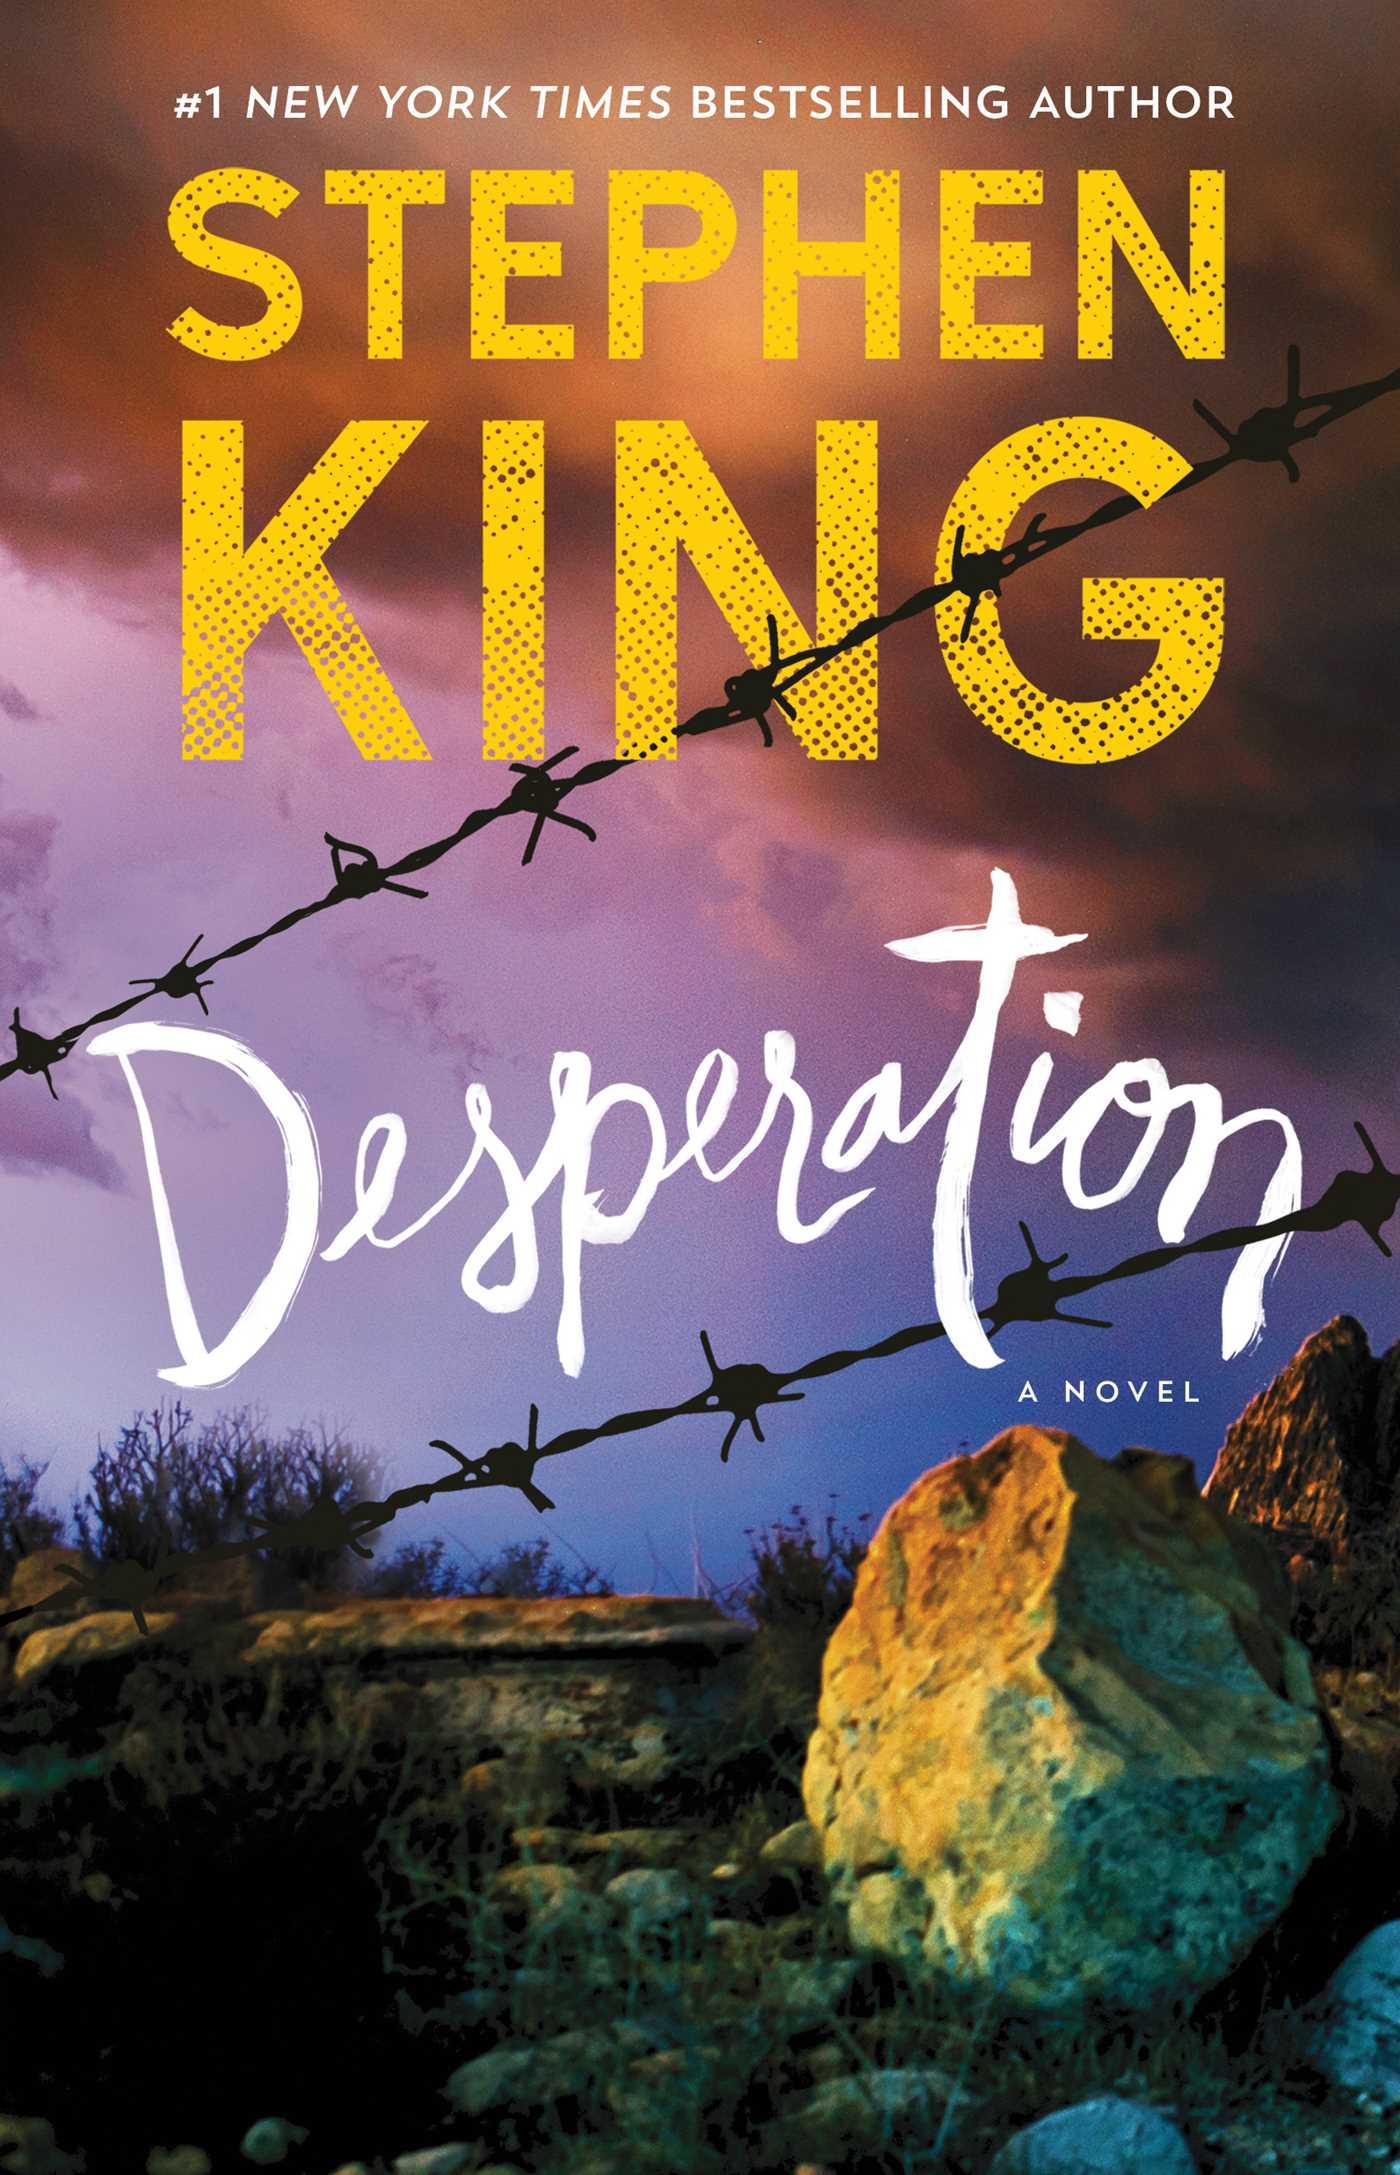 Desperation 9781501141164 hr